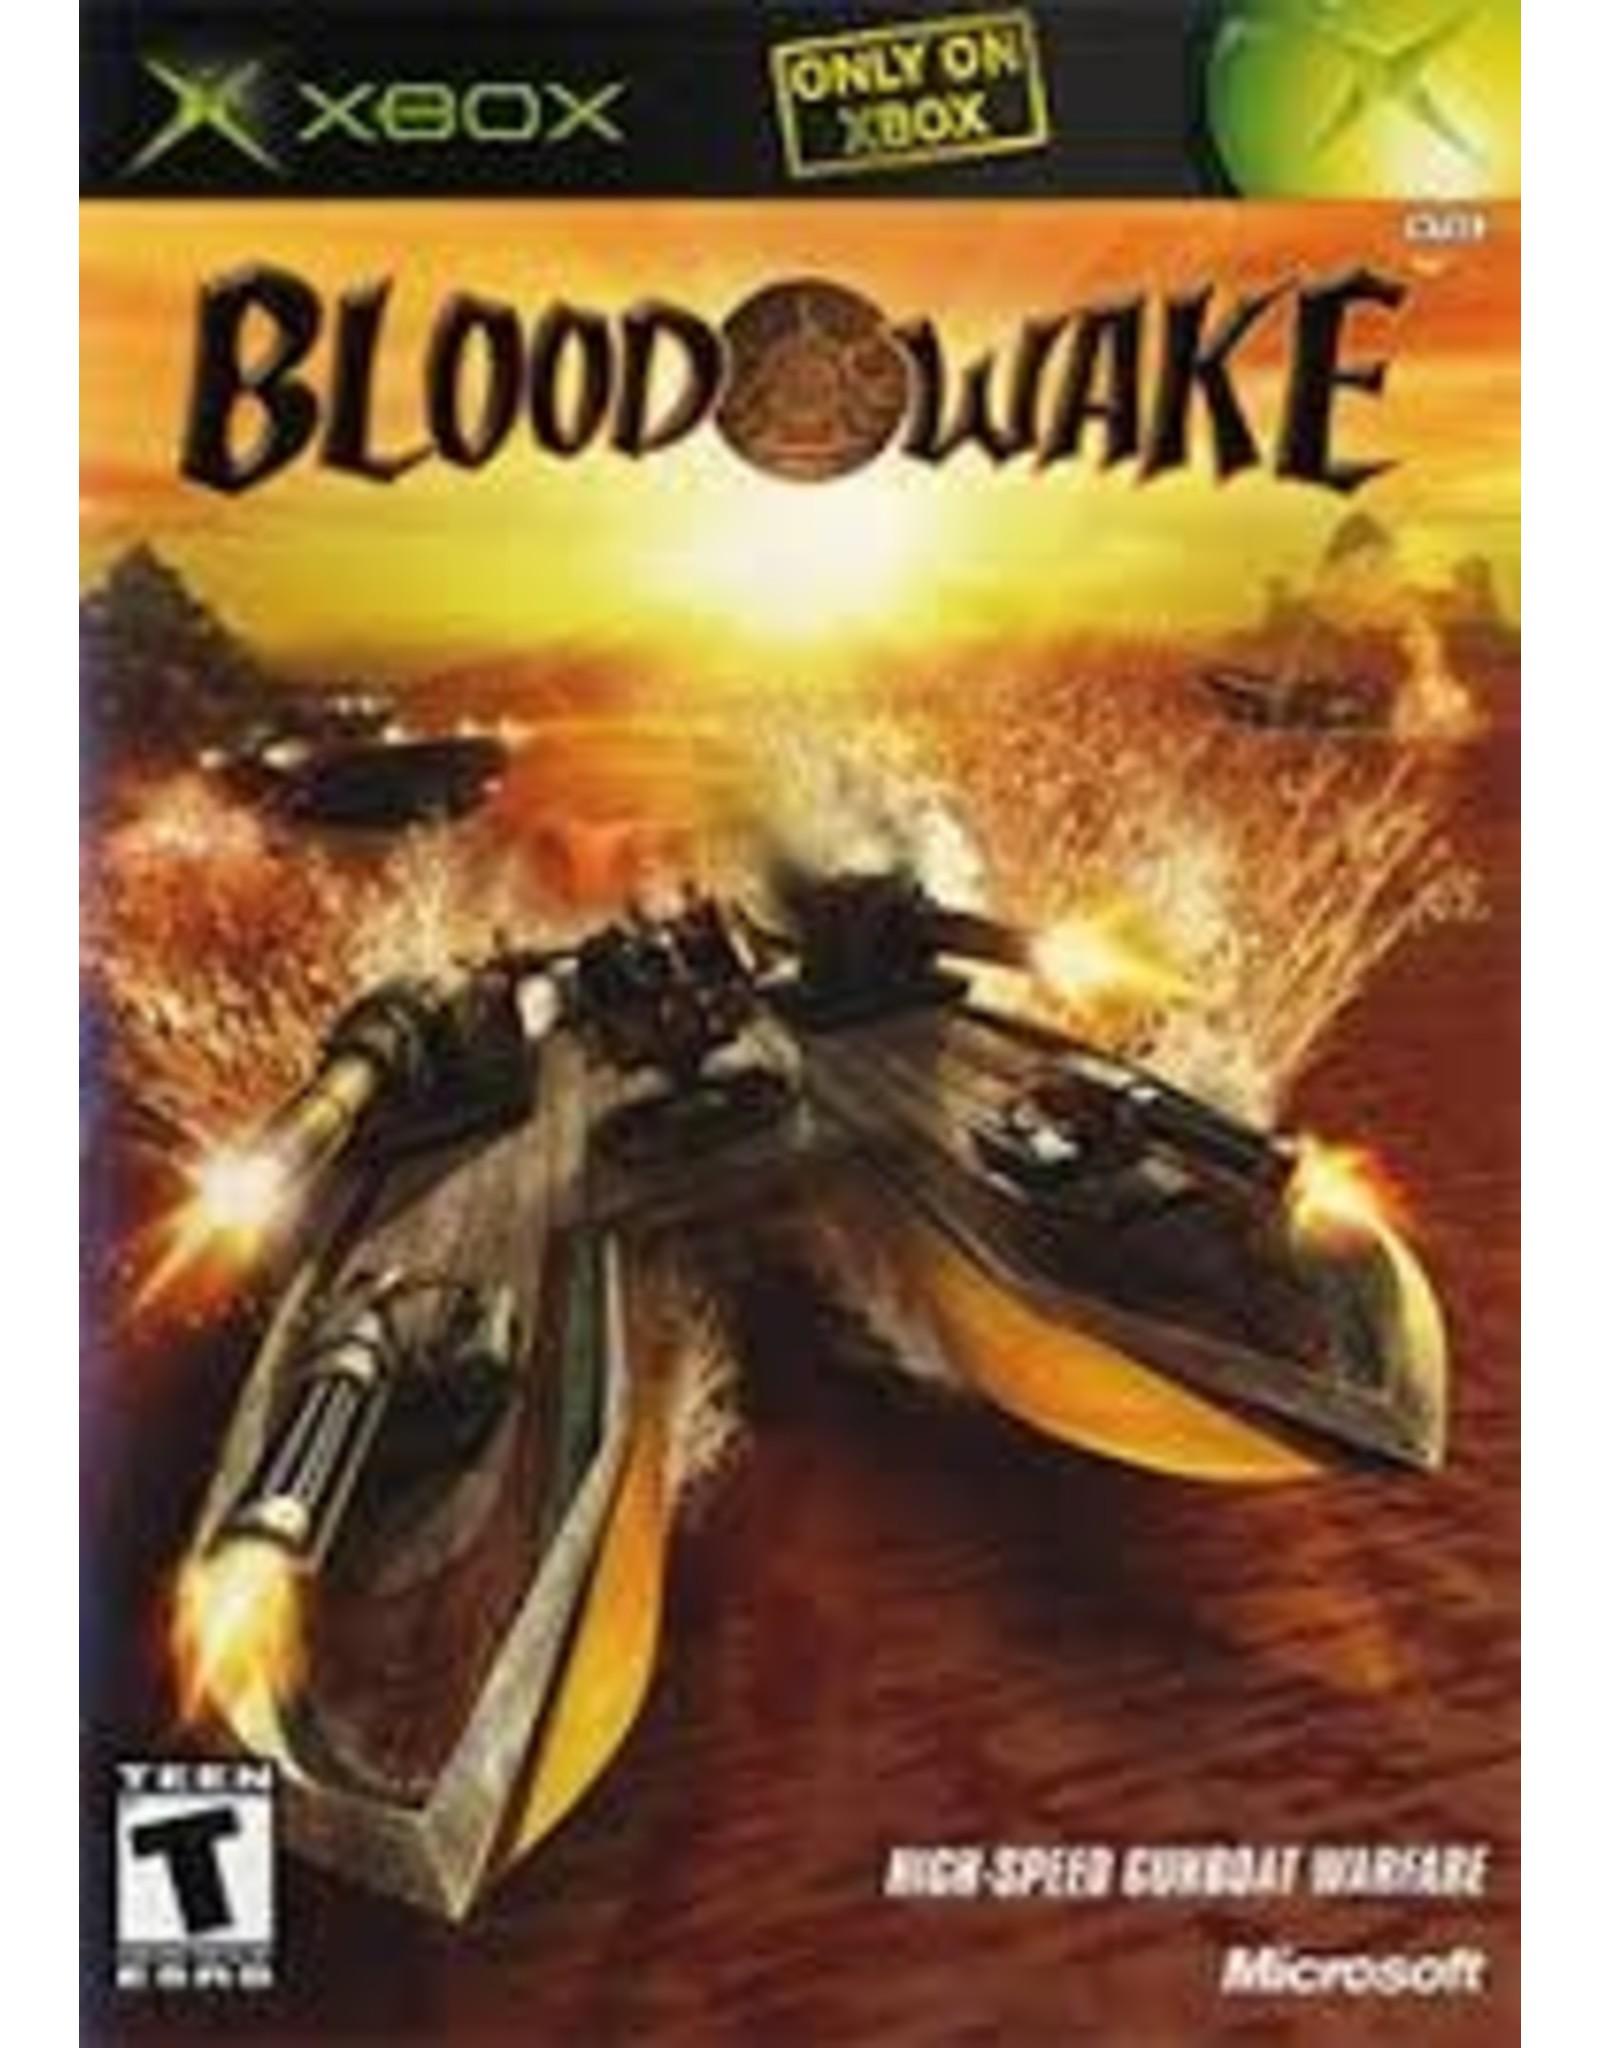 Xbox Blood Wake (No Manual)